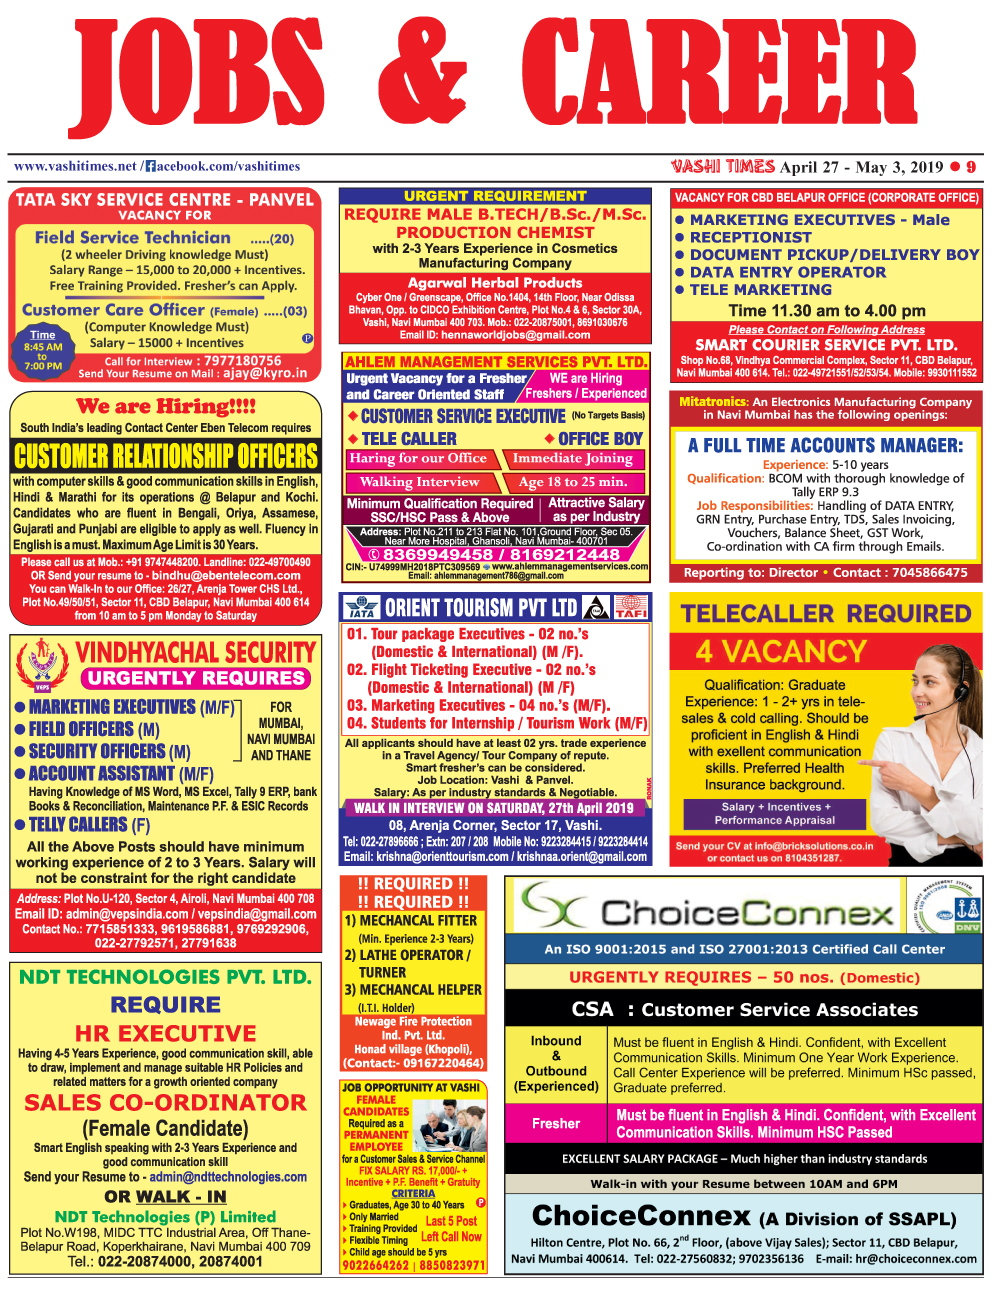 Get Job Vacancy Today Vashi Times Newspaper Pictures